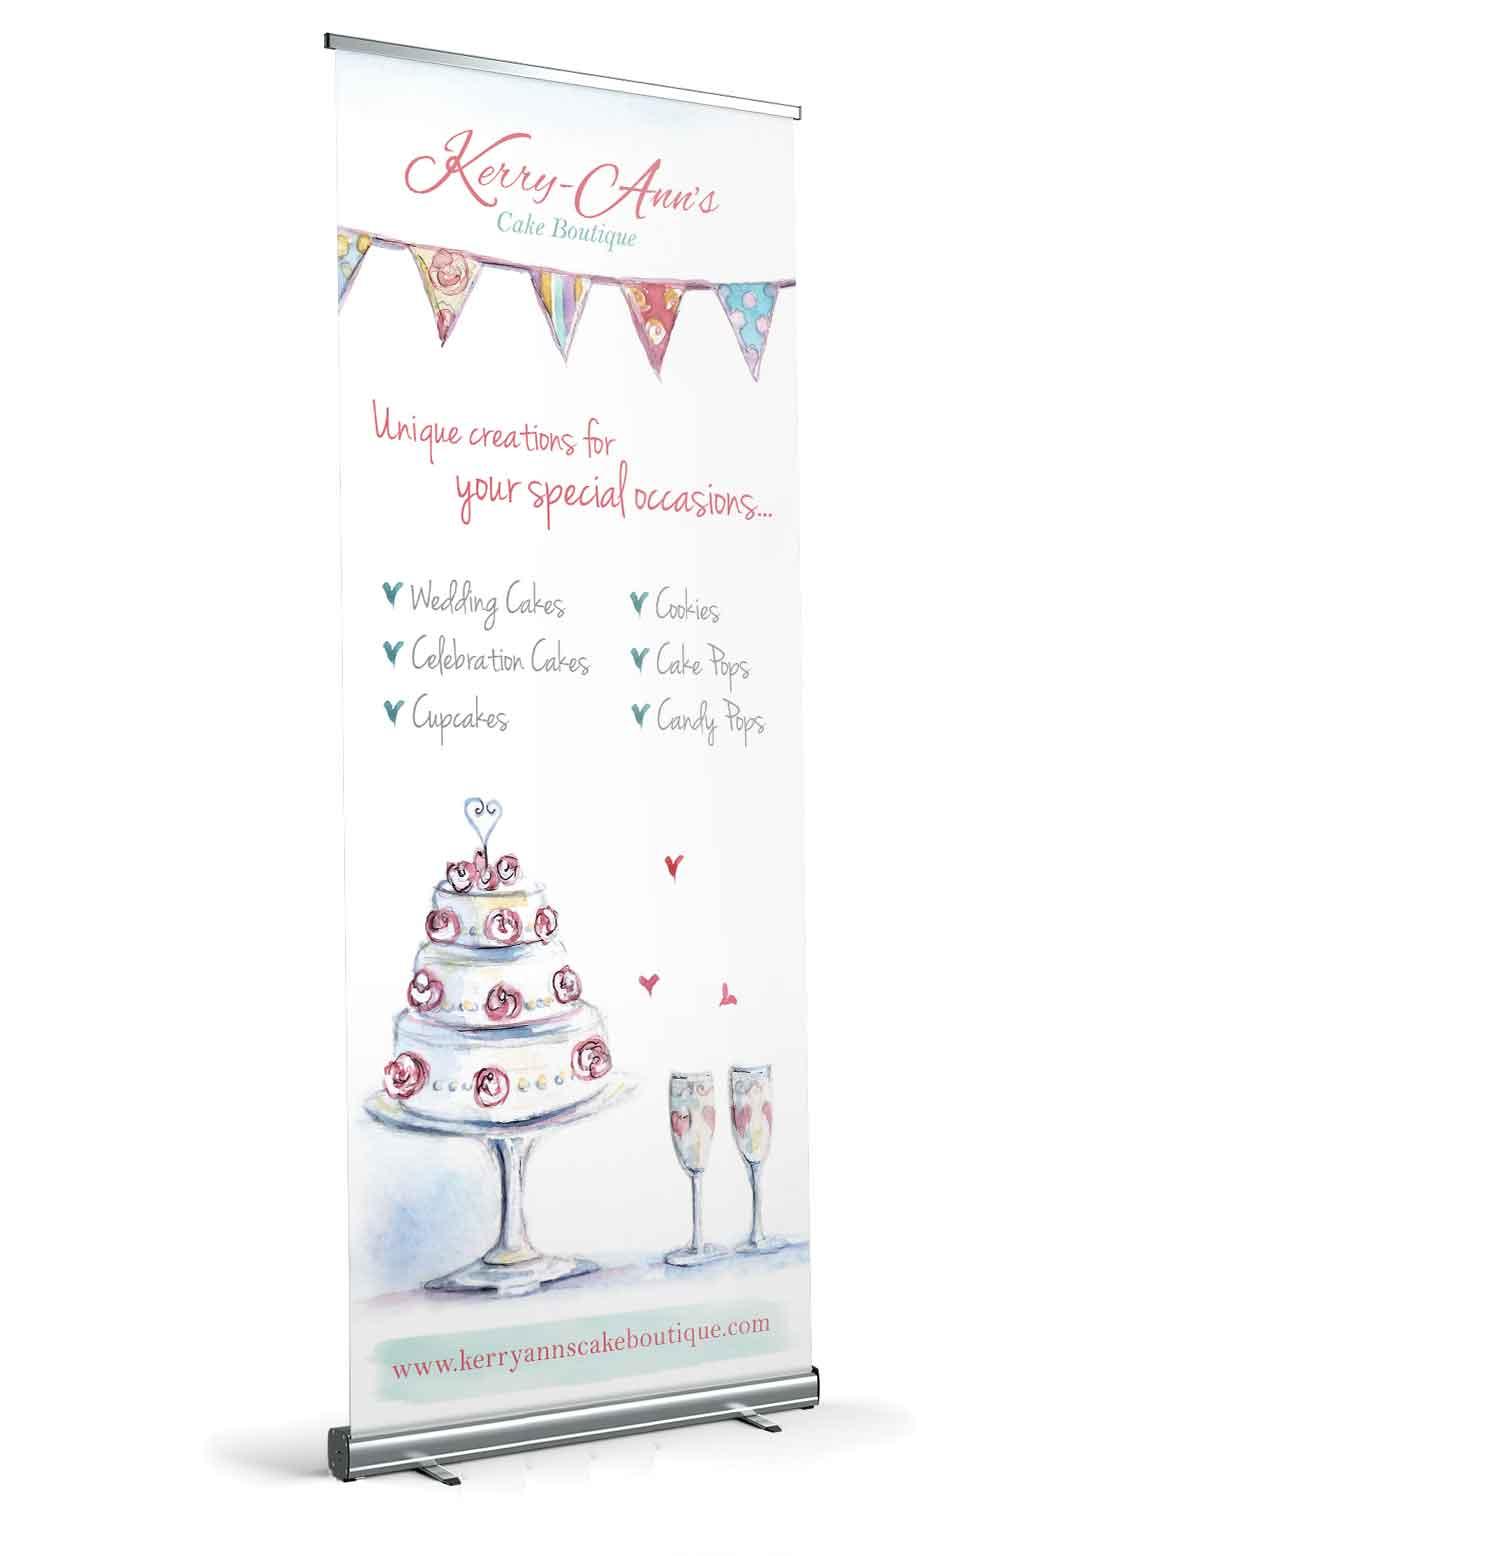 Kerry-Ann's Cake Boutique : Design Portfolio | Vanilla Gecko